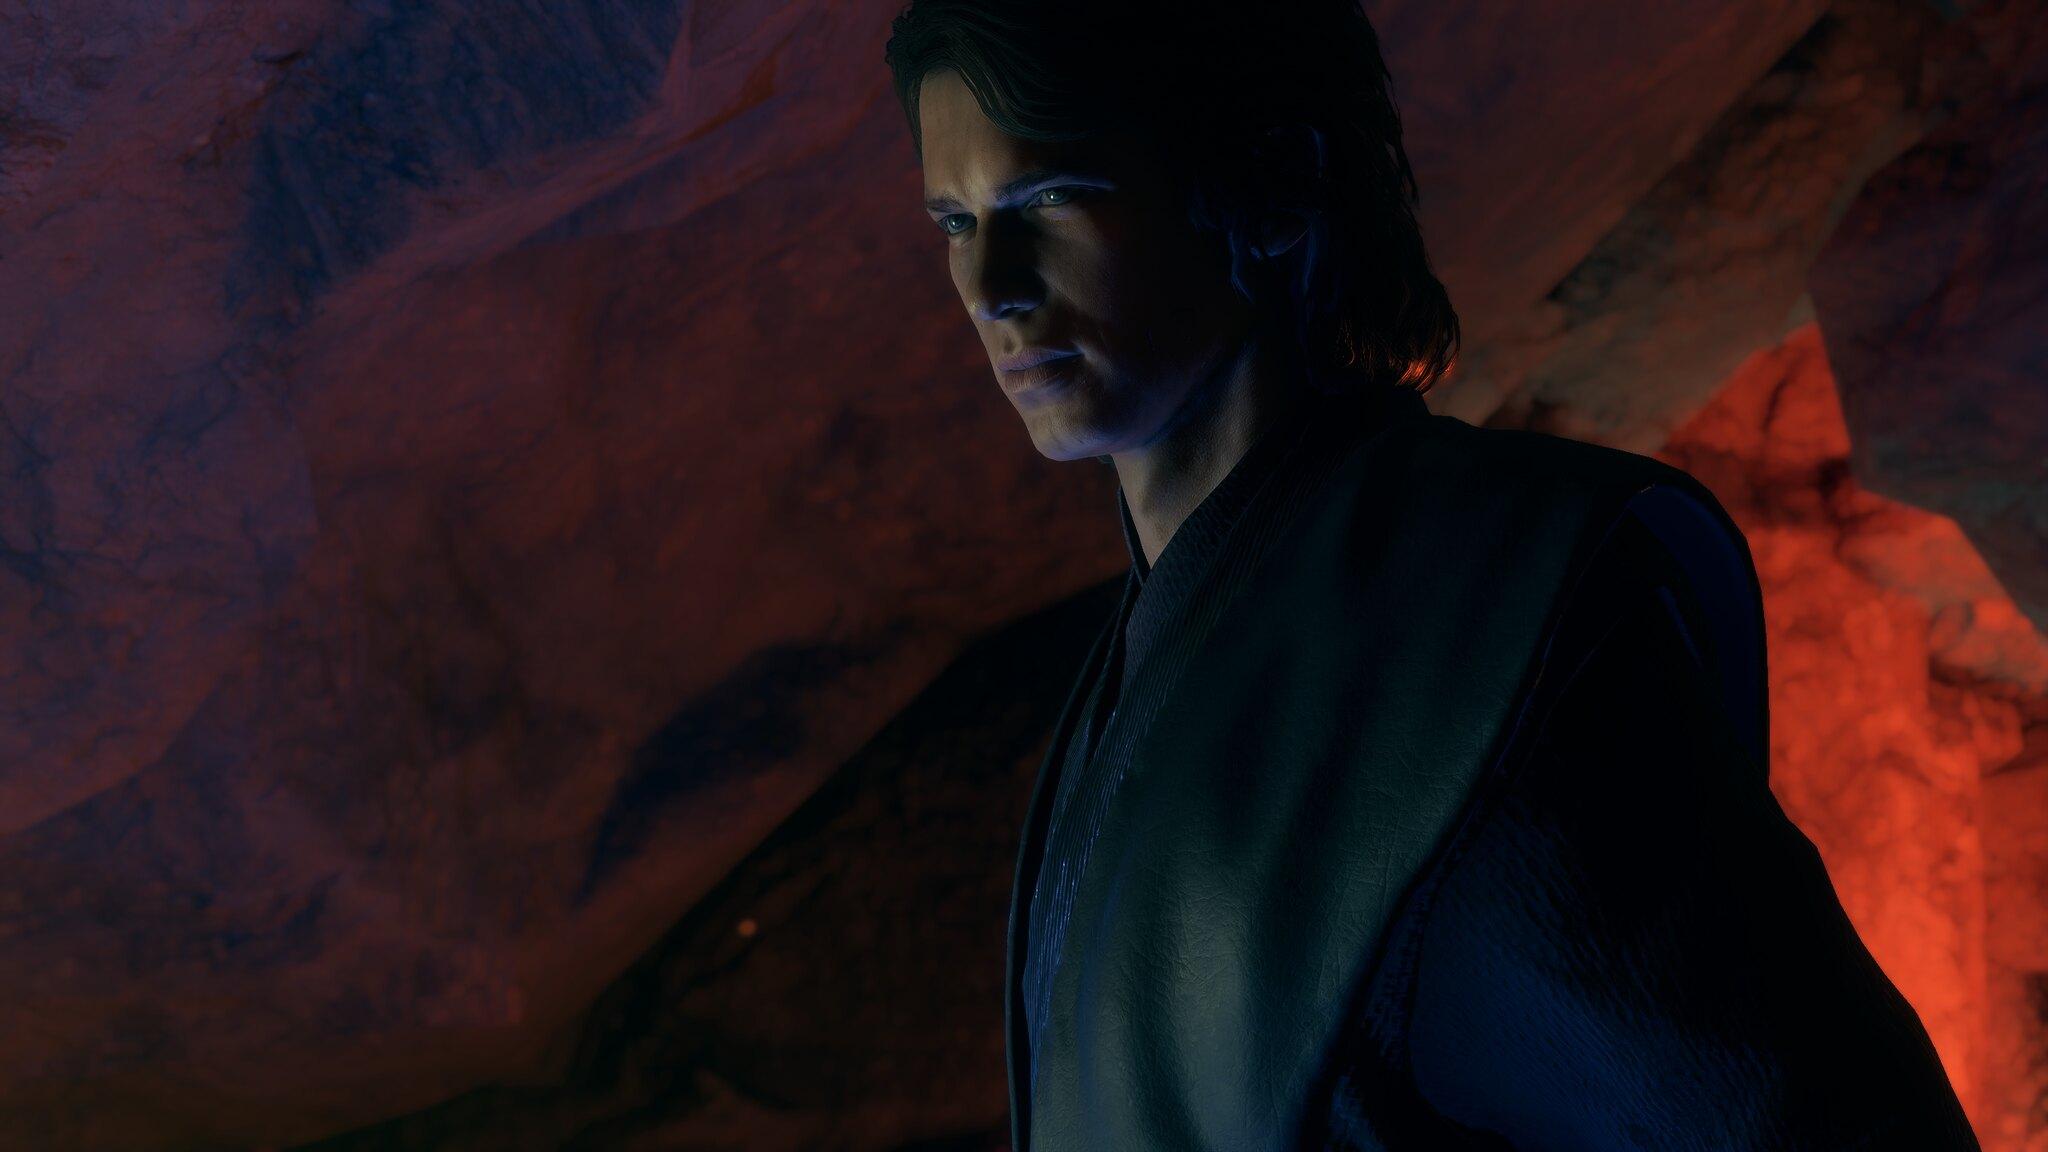 46505500554_603043901d_k.jpg - Star Wars: Battlefront 2 (2017)